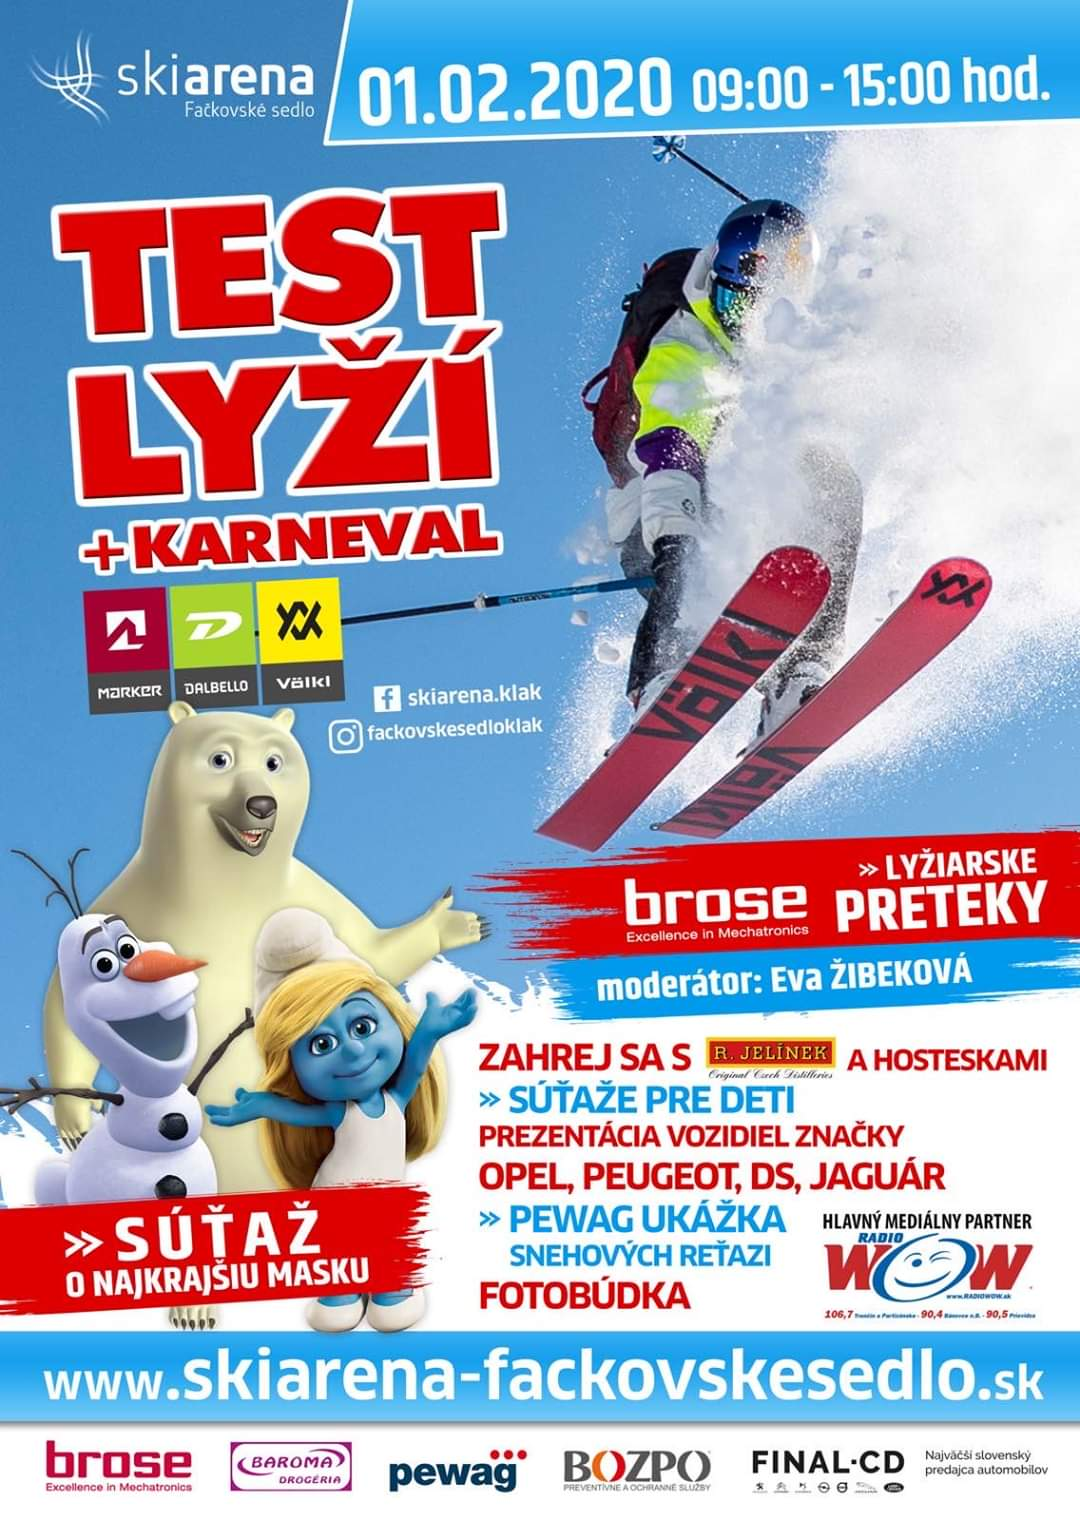 Test lyží VÖLKL + karneval 2020